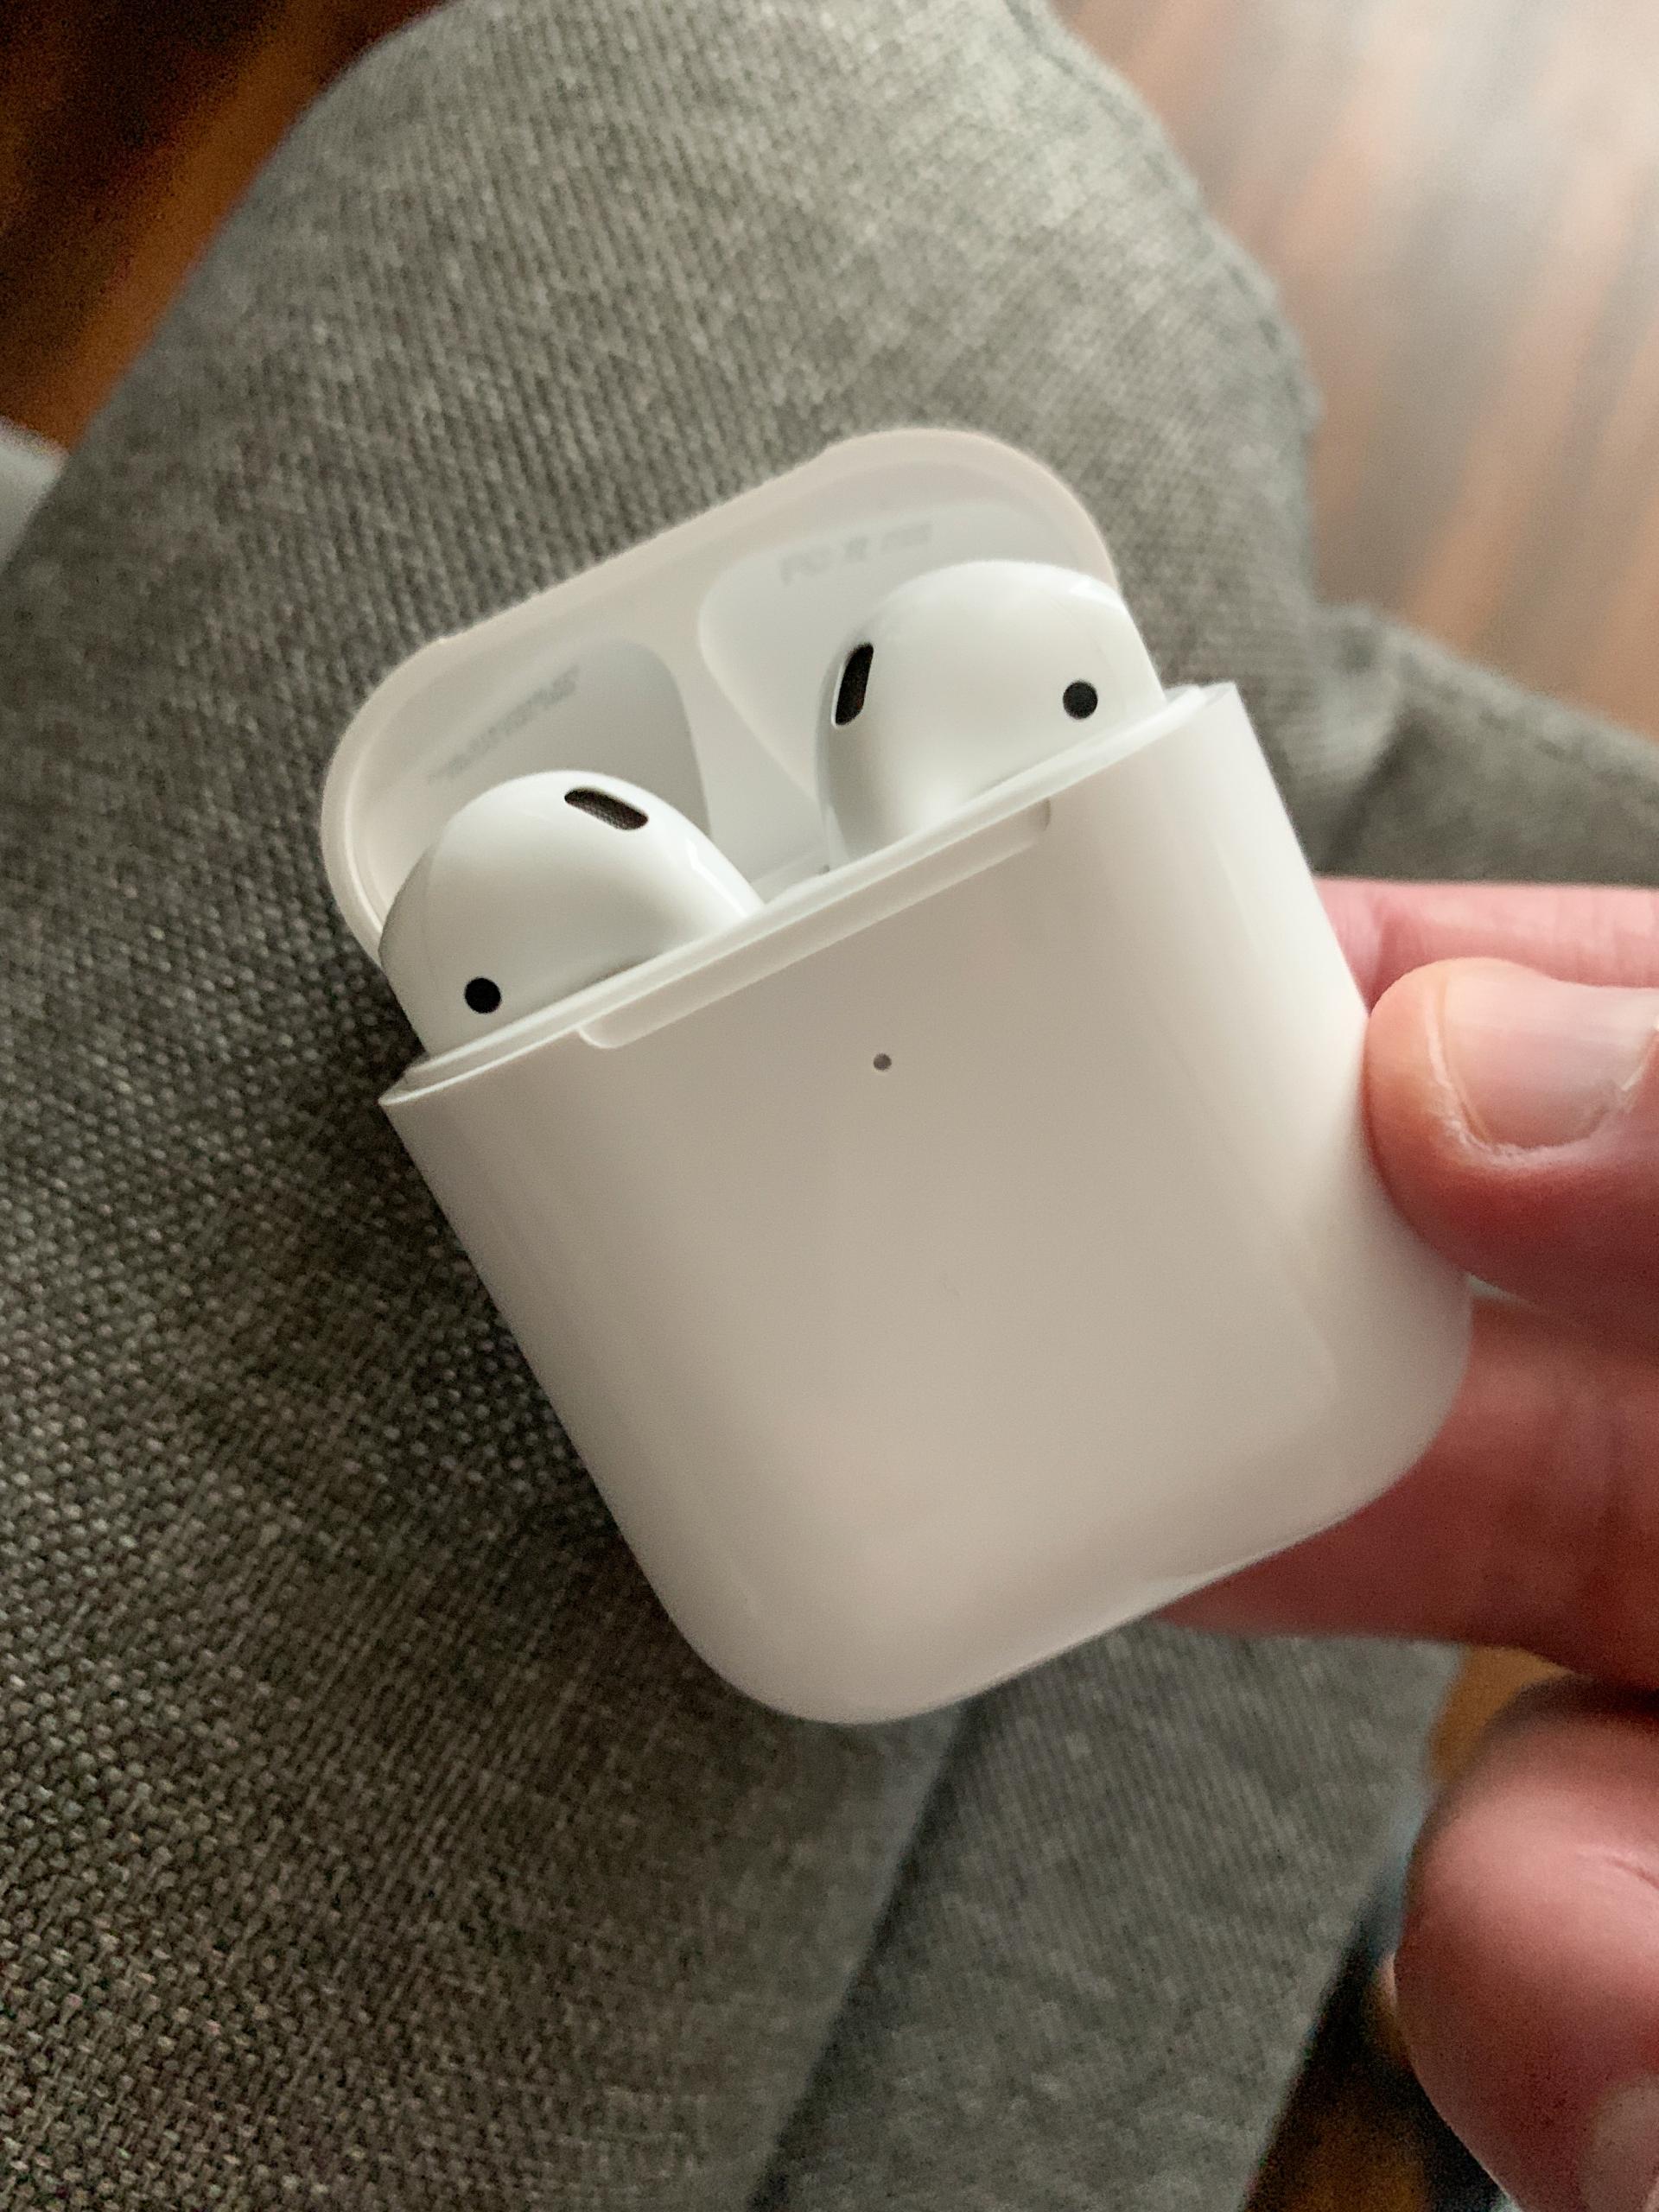 Apple AirPods Generation 2 fake